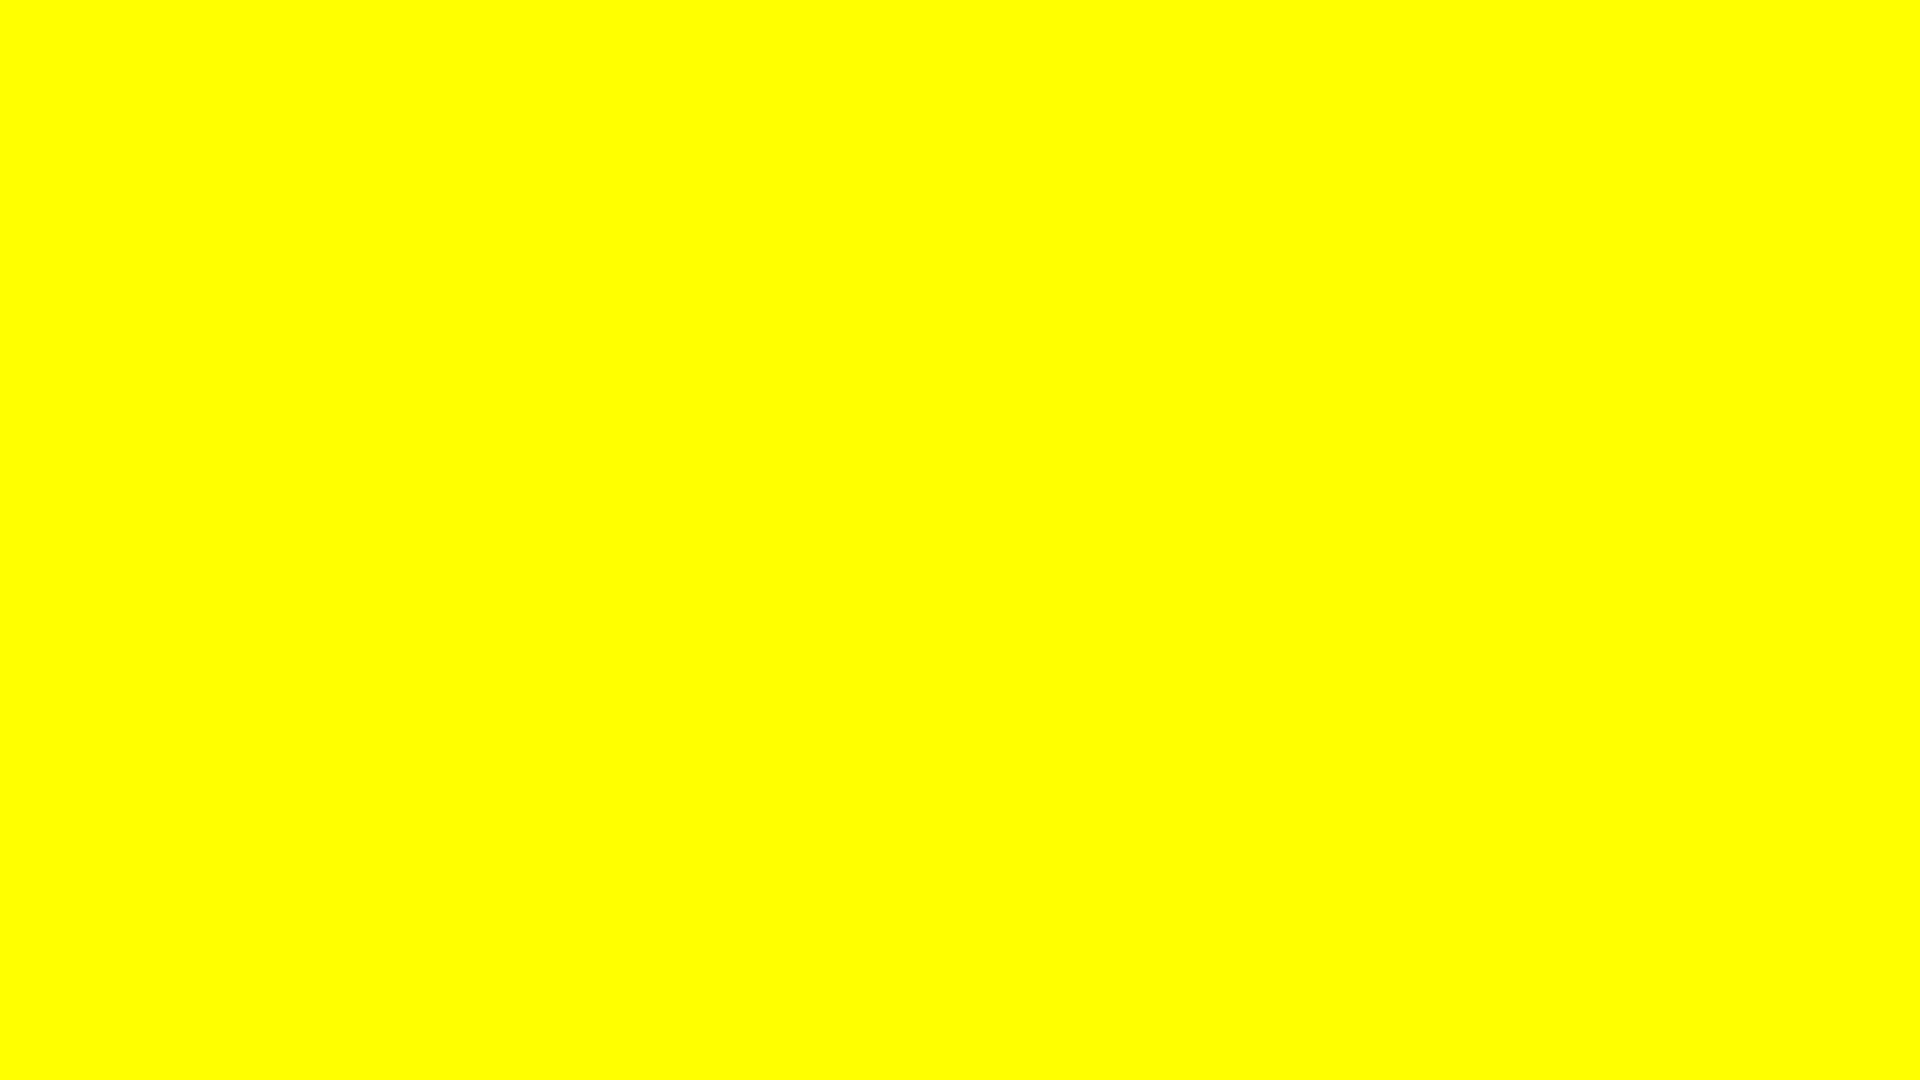 Yellow colur photo